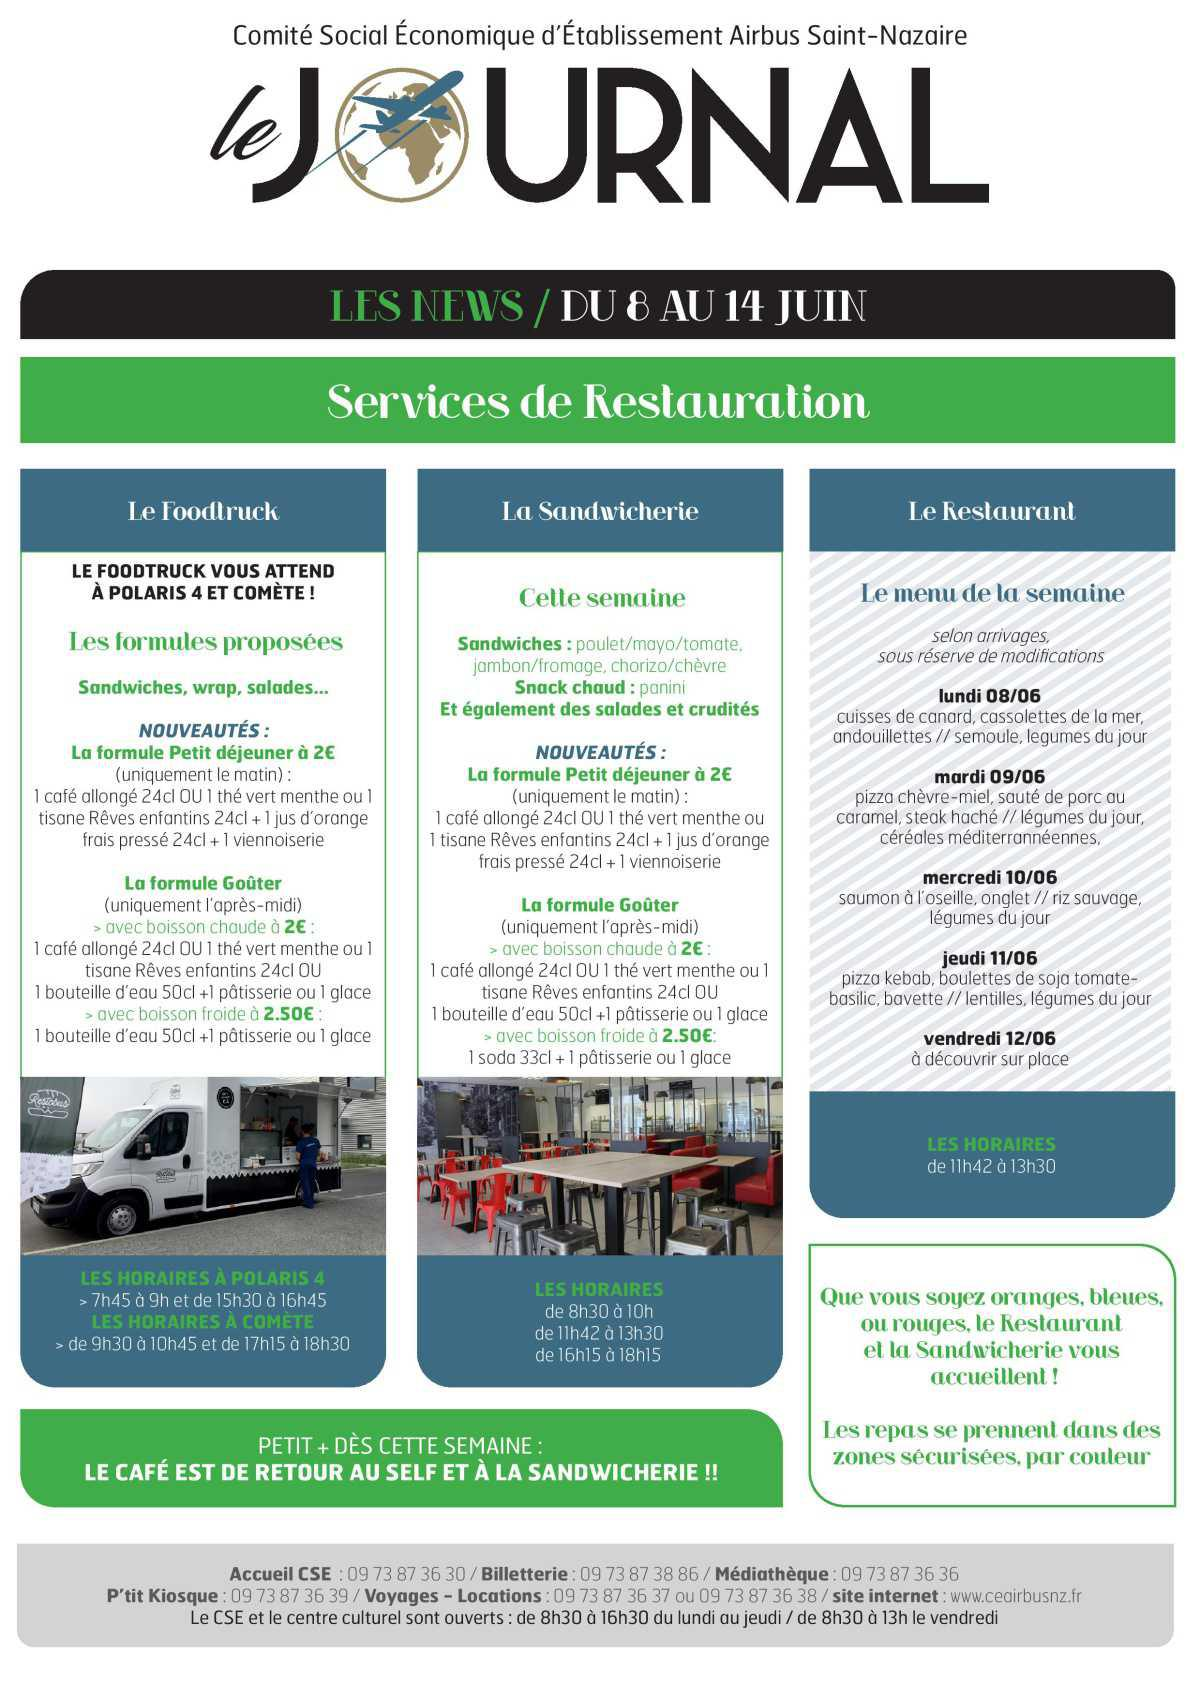 Informations CSE et COOP semaine 24